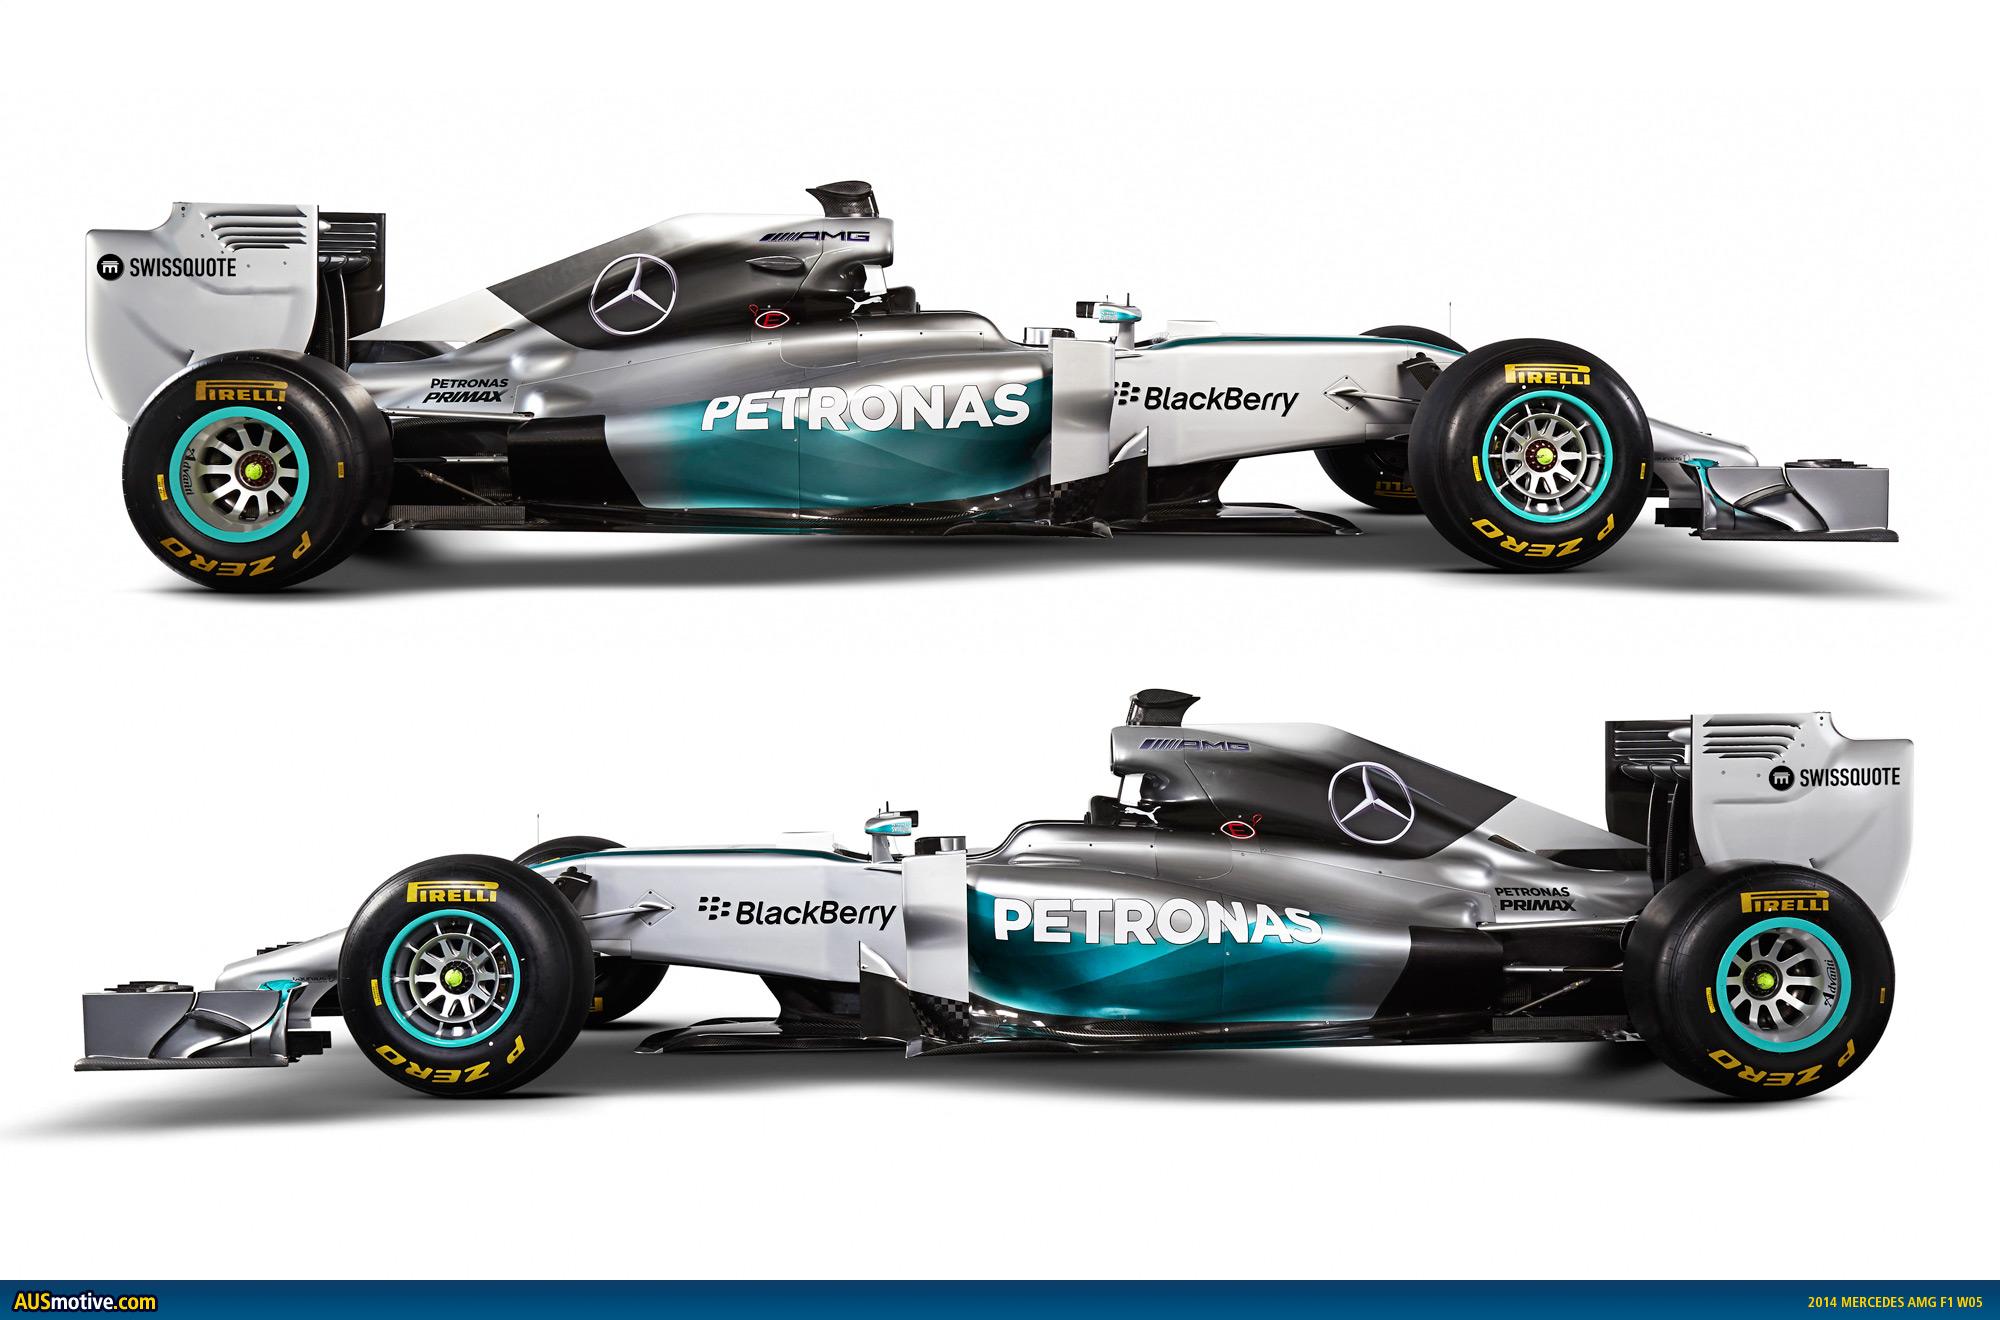 AUSmotive.com » 2014 Mercedes AMG F1 W05 revealed